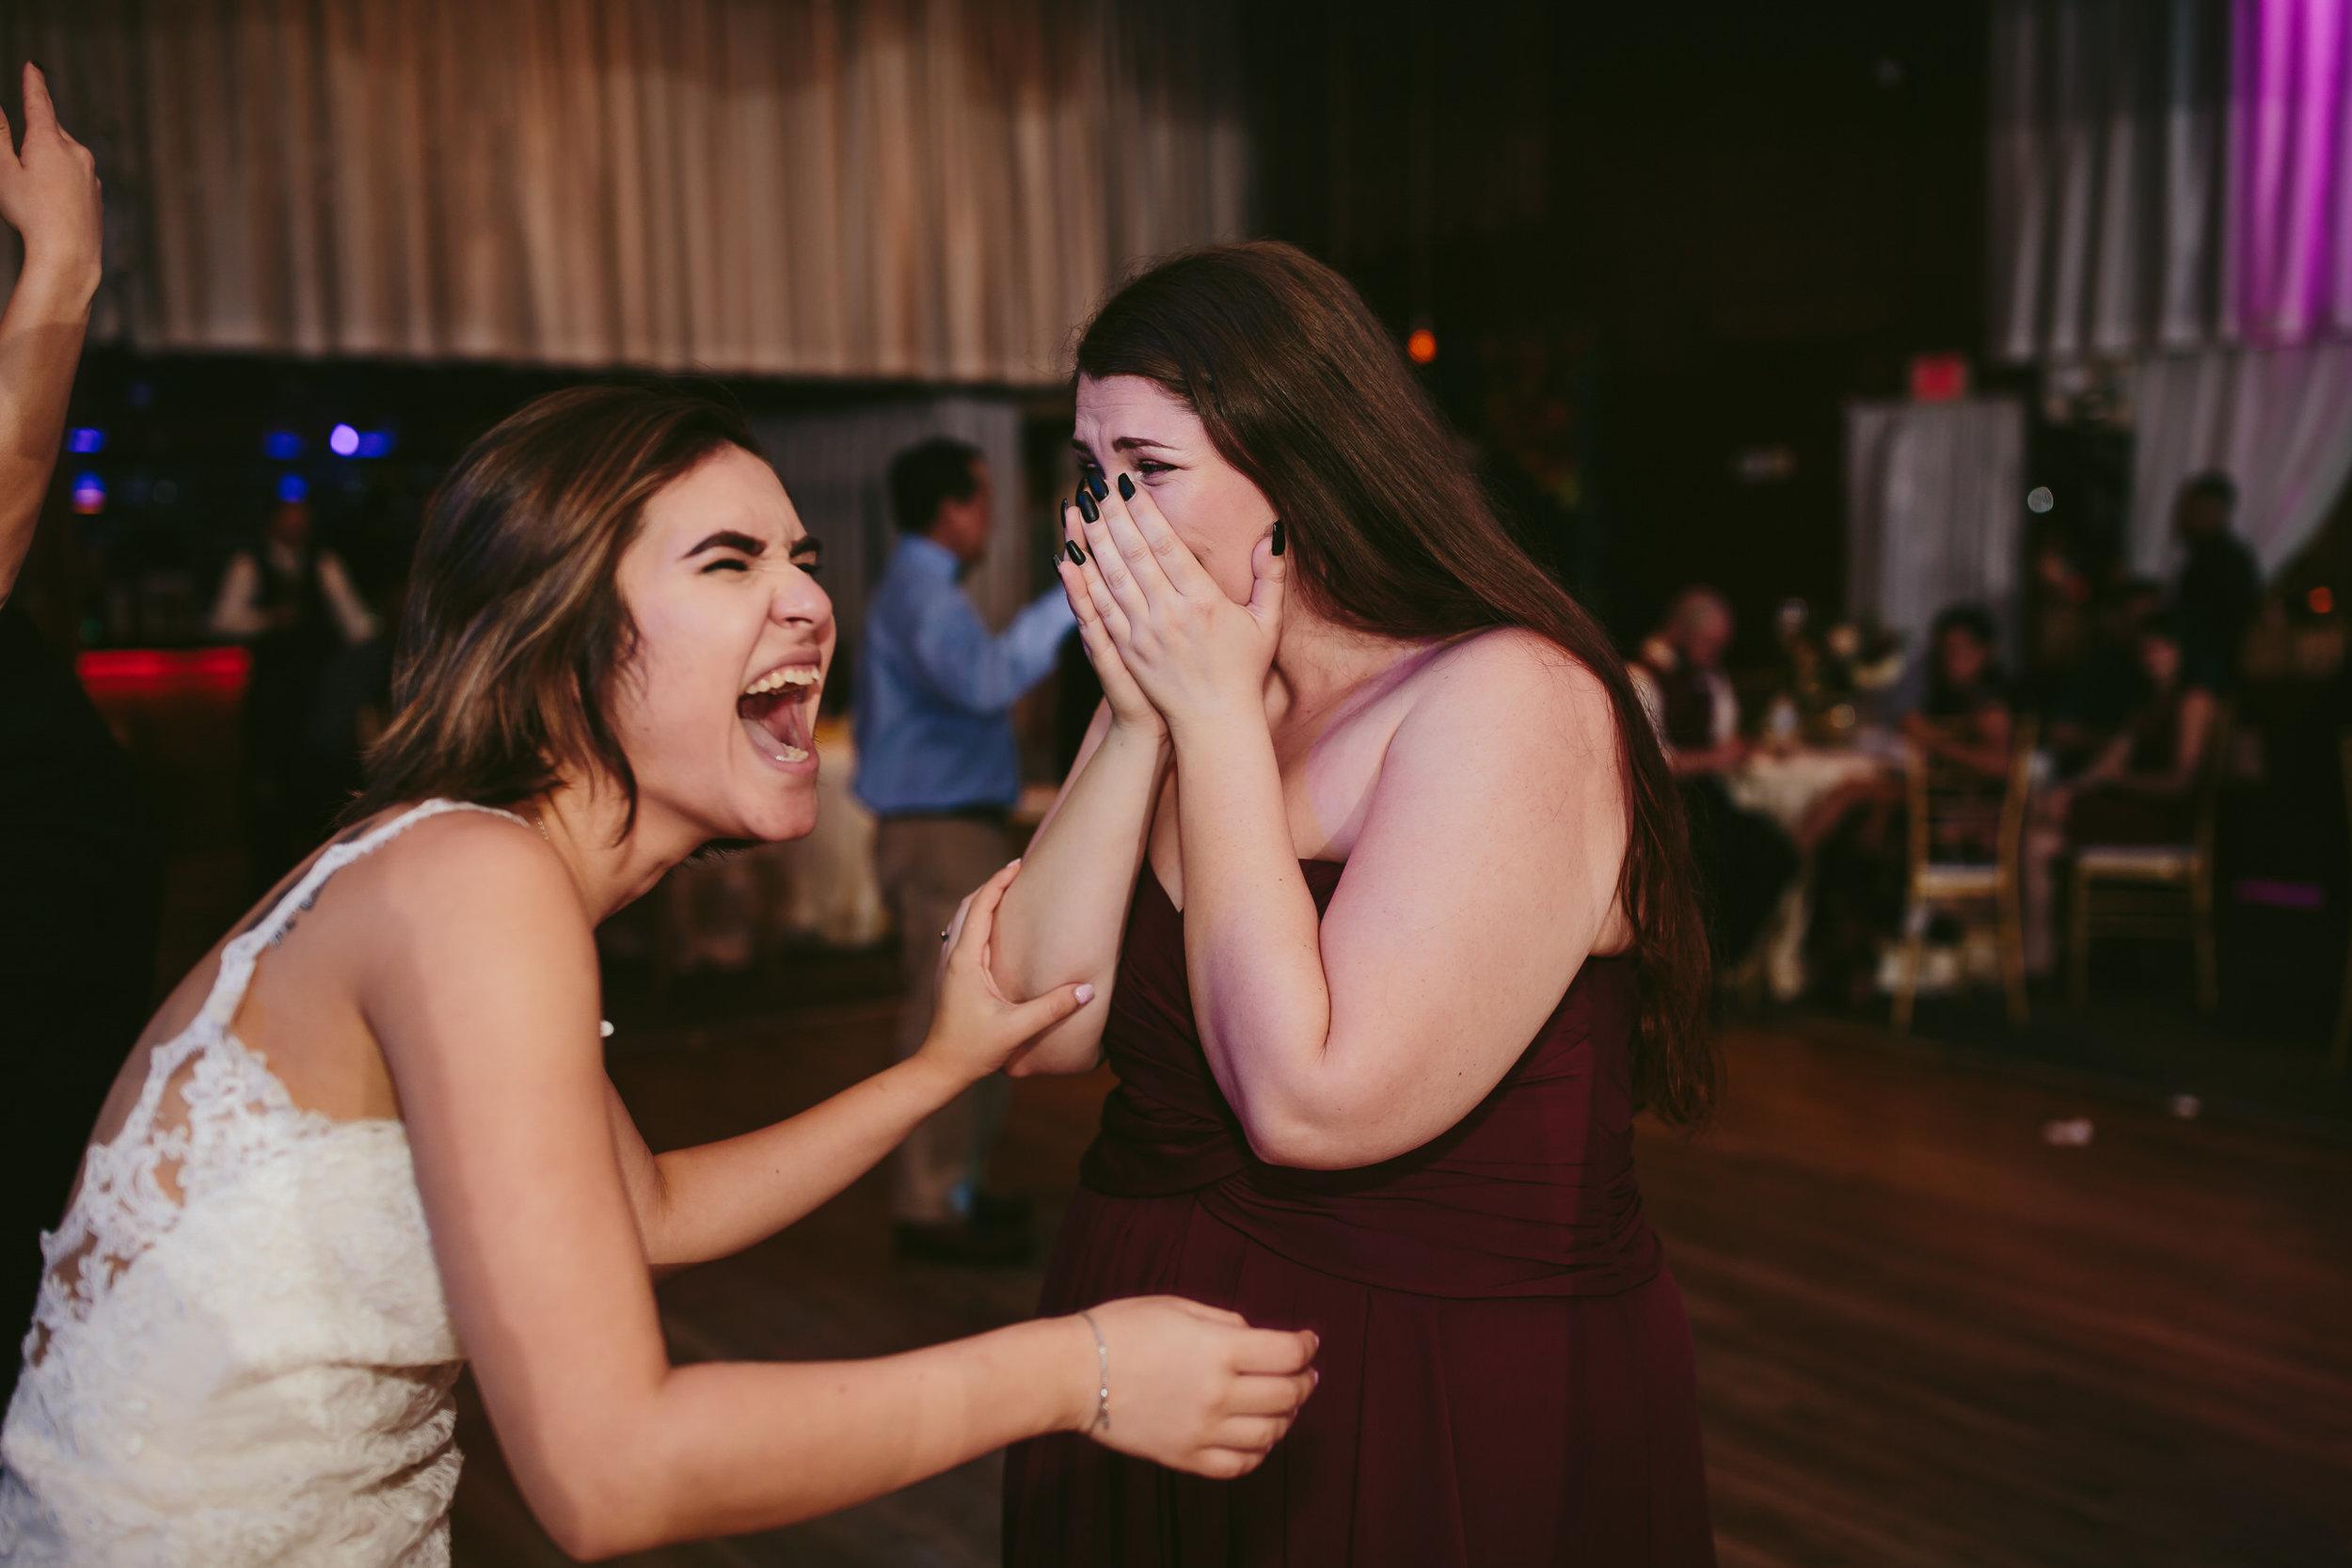 laughter_fun_wedding_reception_tiny_house_photo.jpg